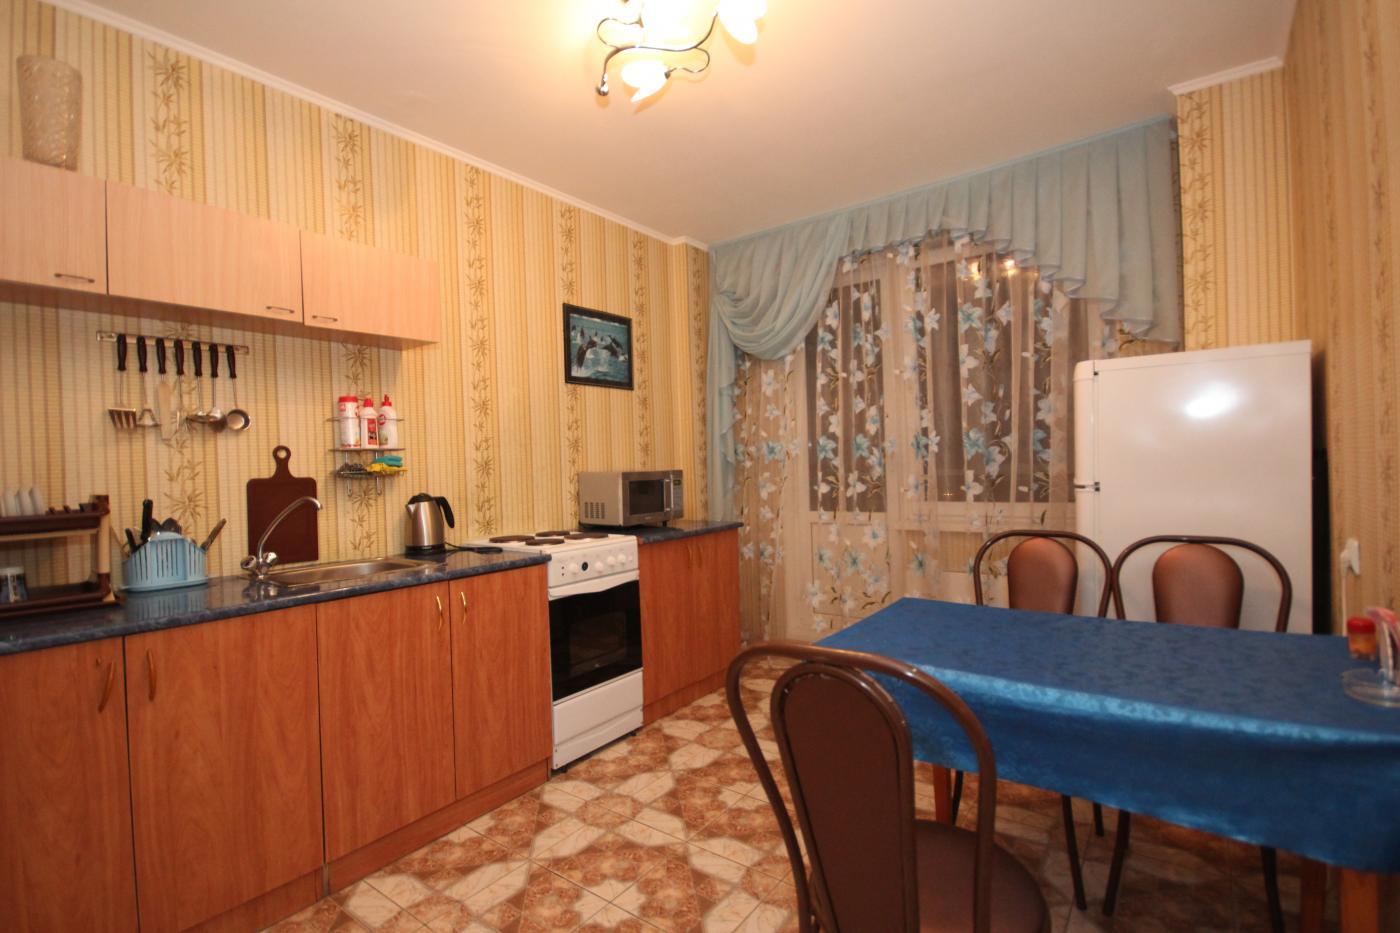 1-комнатная квартира посуточно (вариант № 1749), ул. Победы бульвар, фото № 4